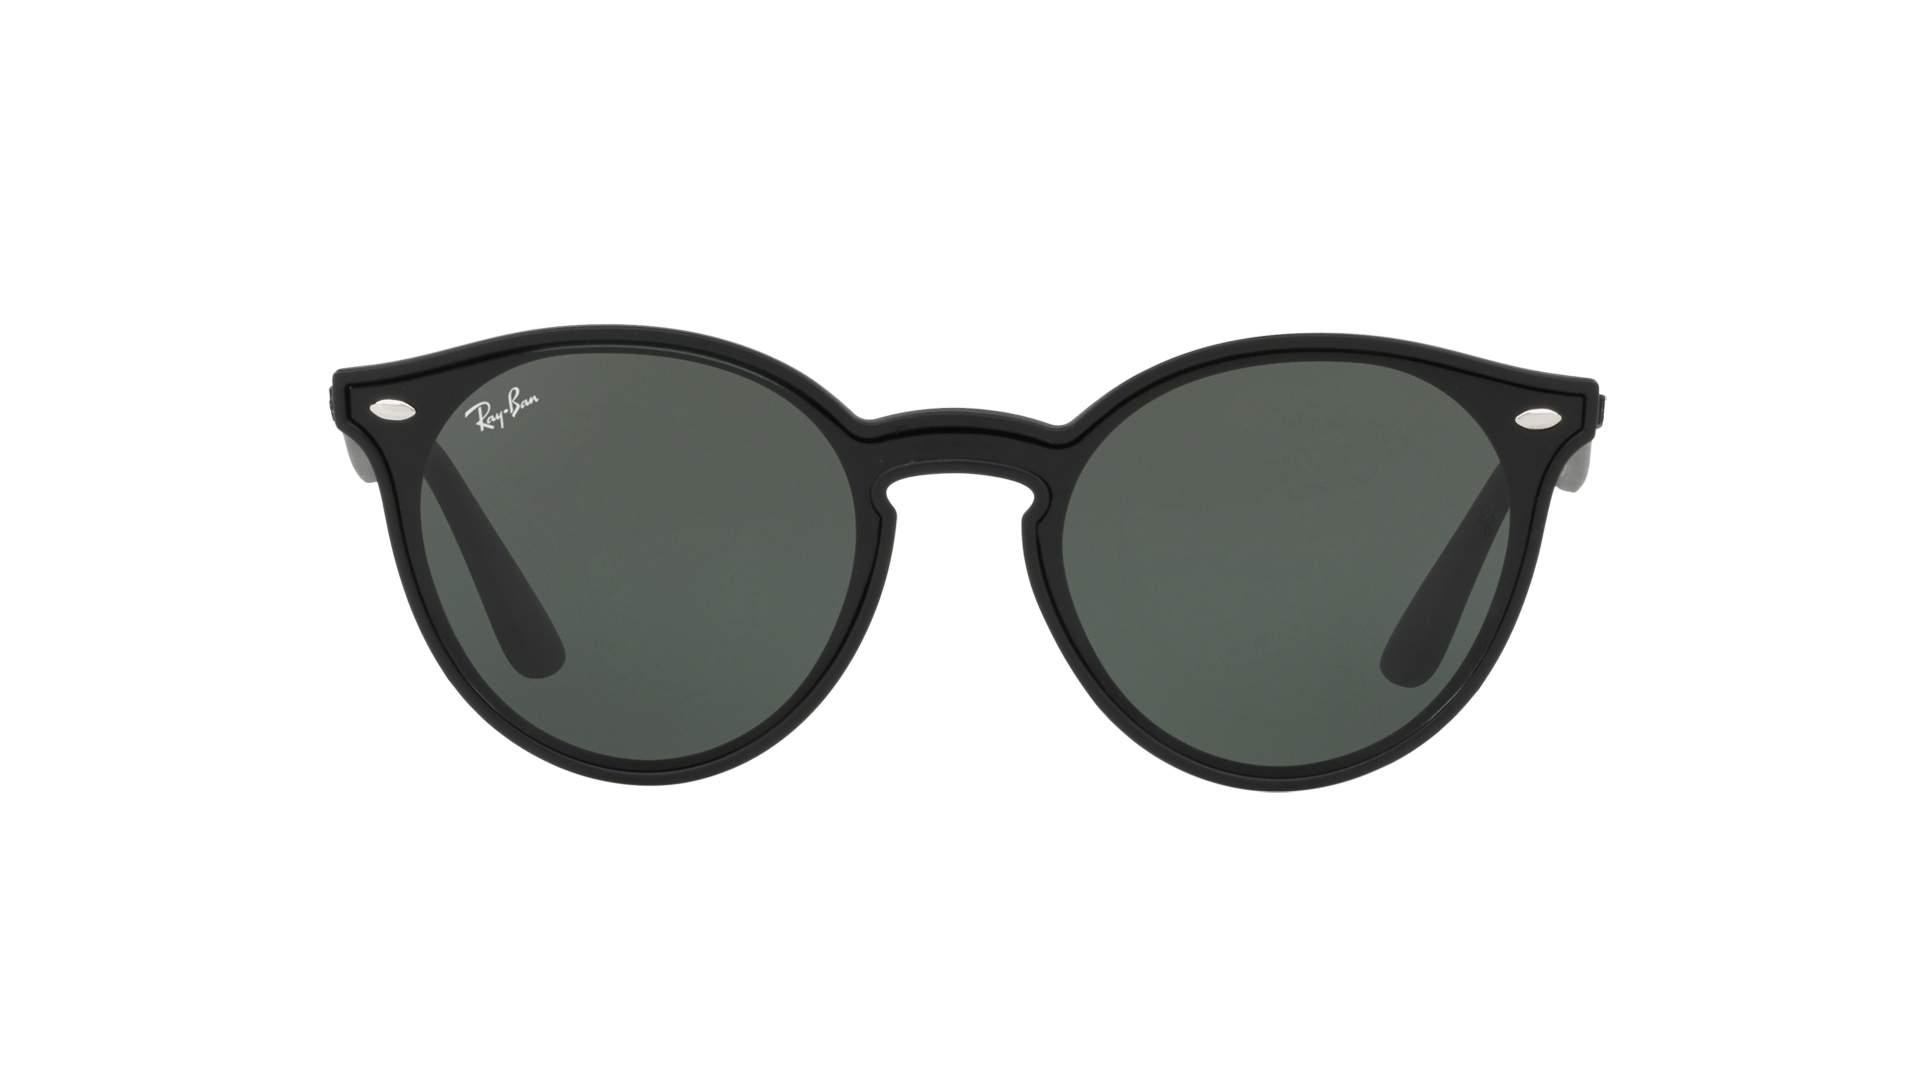 30fc34dba8 Sunglasses Ray-Ban Blaze RB4380N 601S 71 37-17 Black Matte Medium